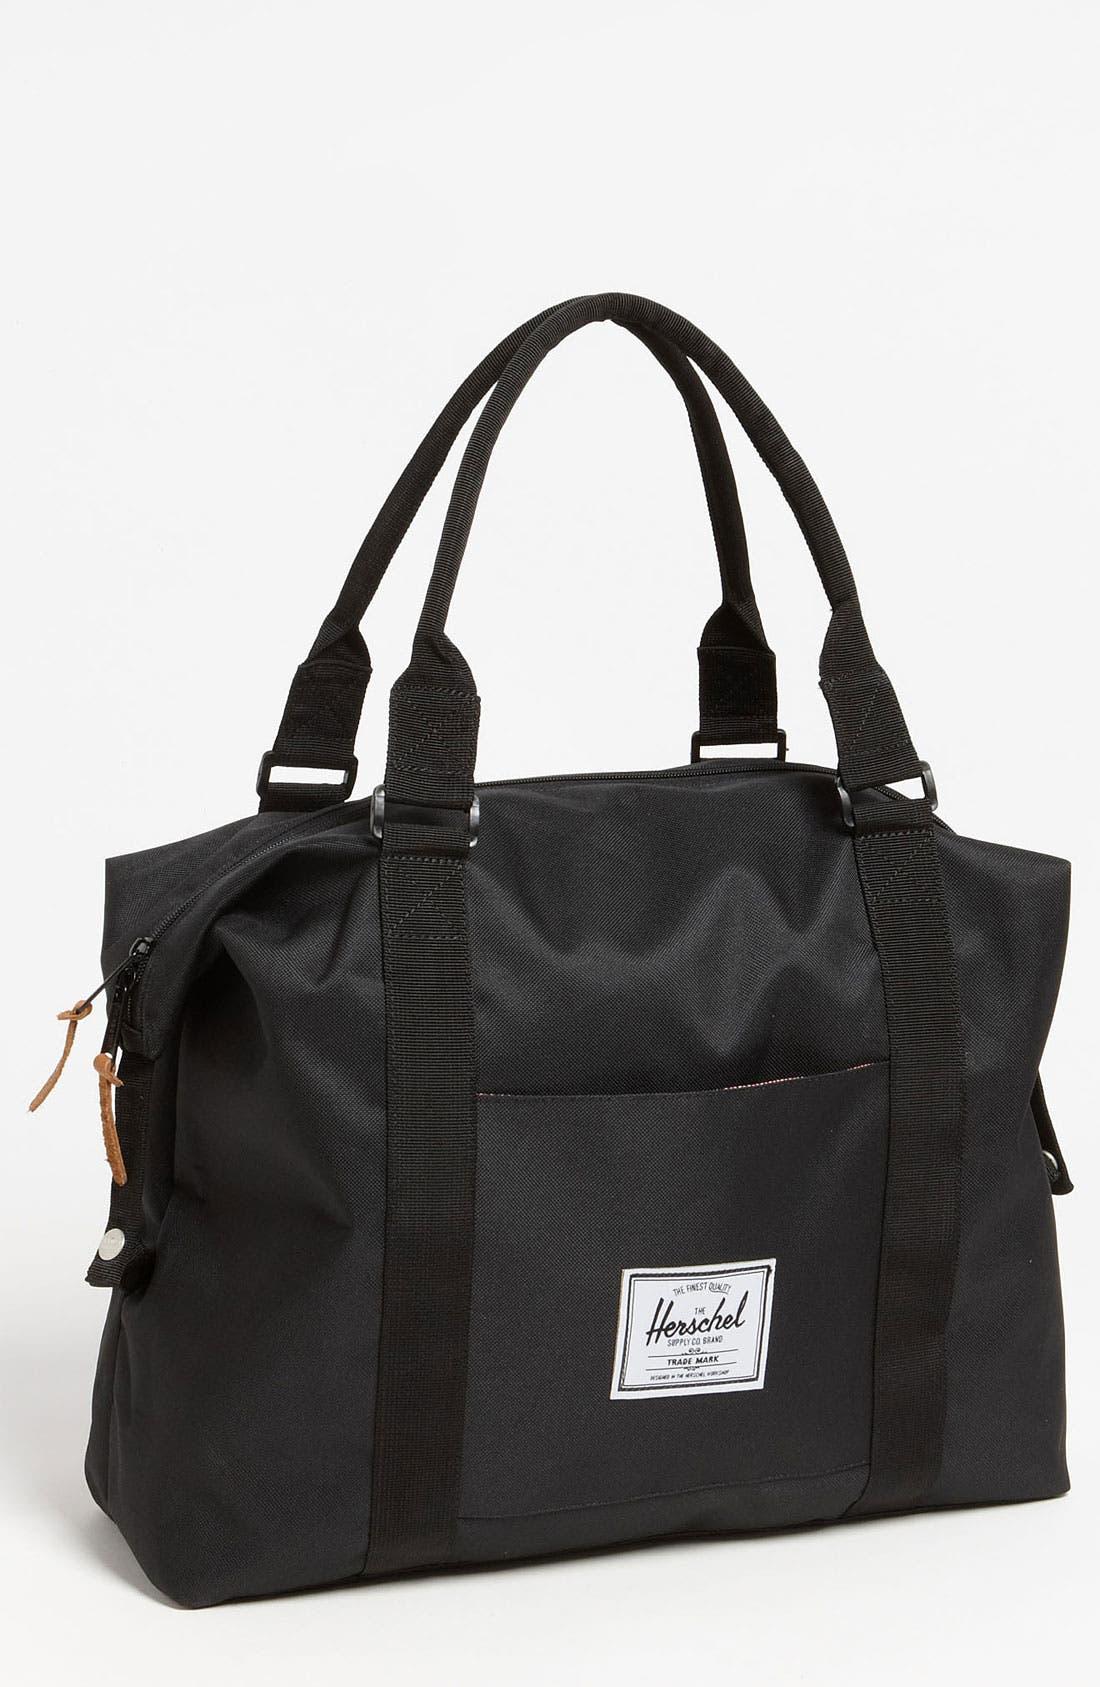 Main Image - Herschel Supply Co. 'Strand' Duffel Bag